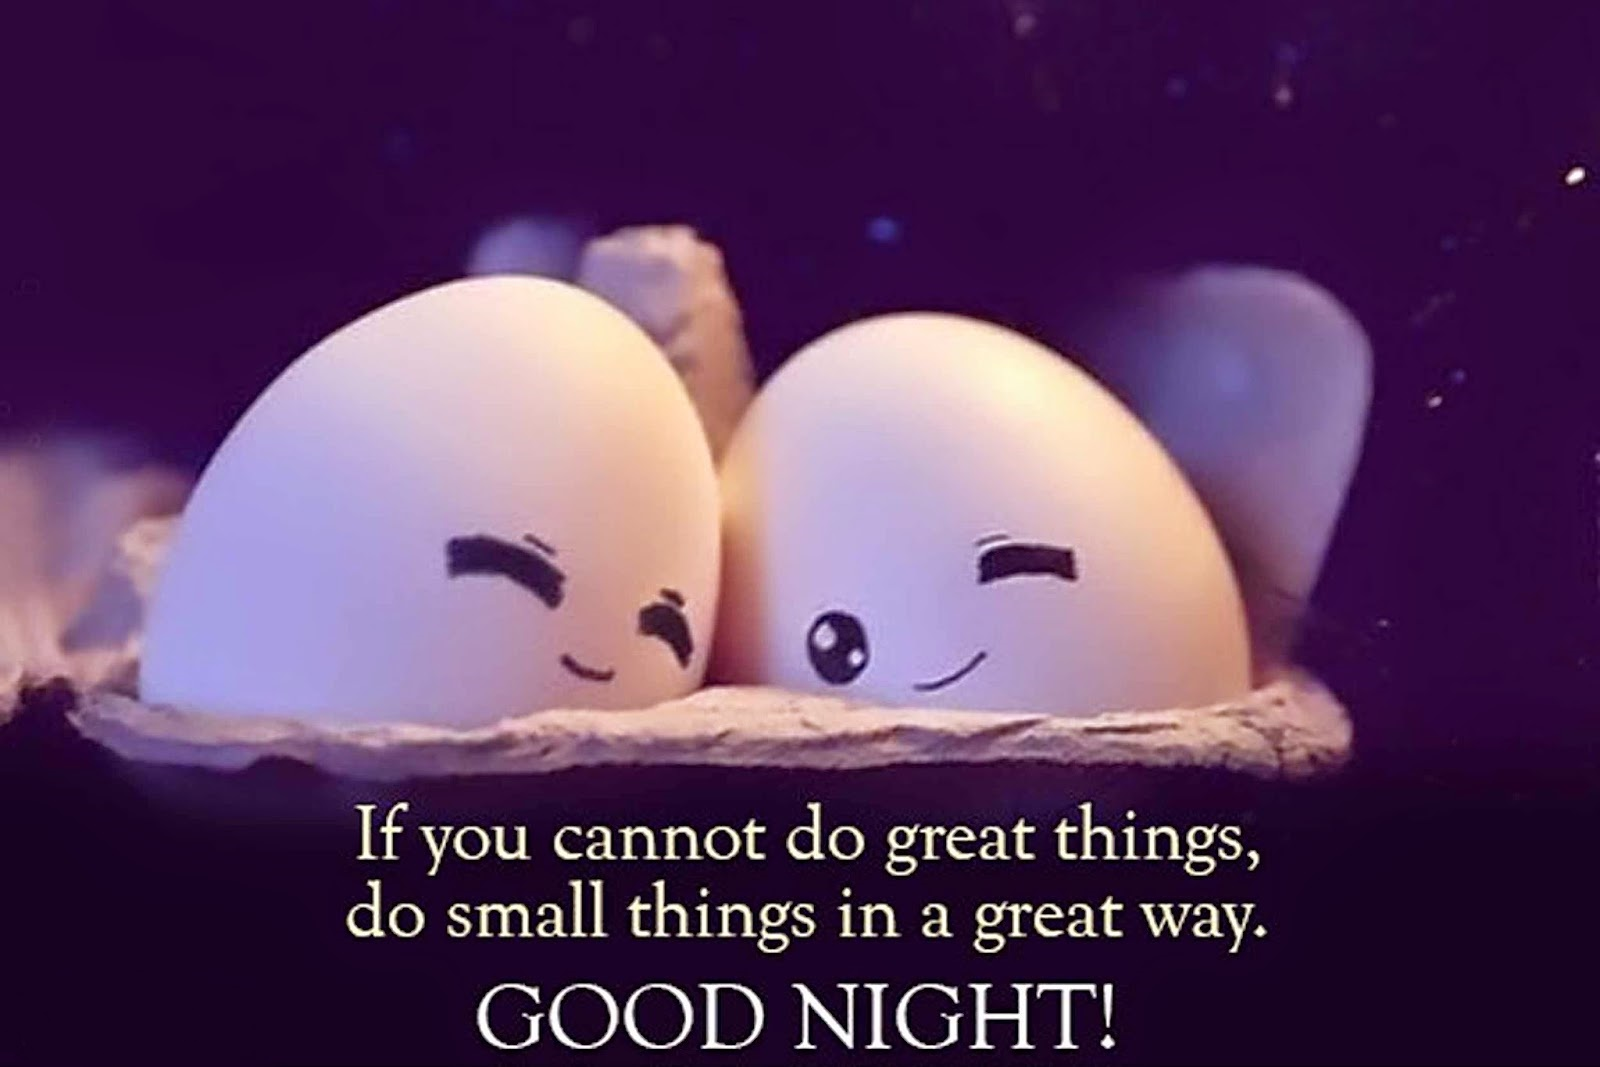 Frase de Buenas noches en Ingles